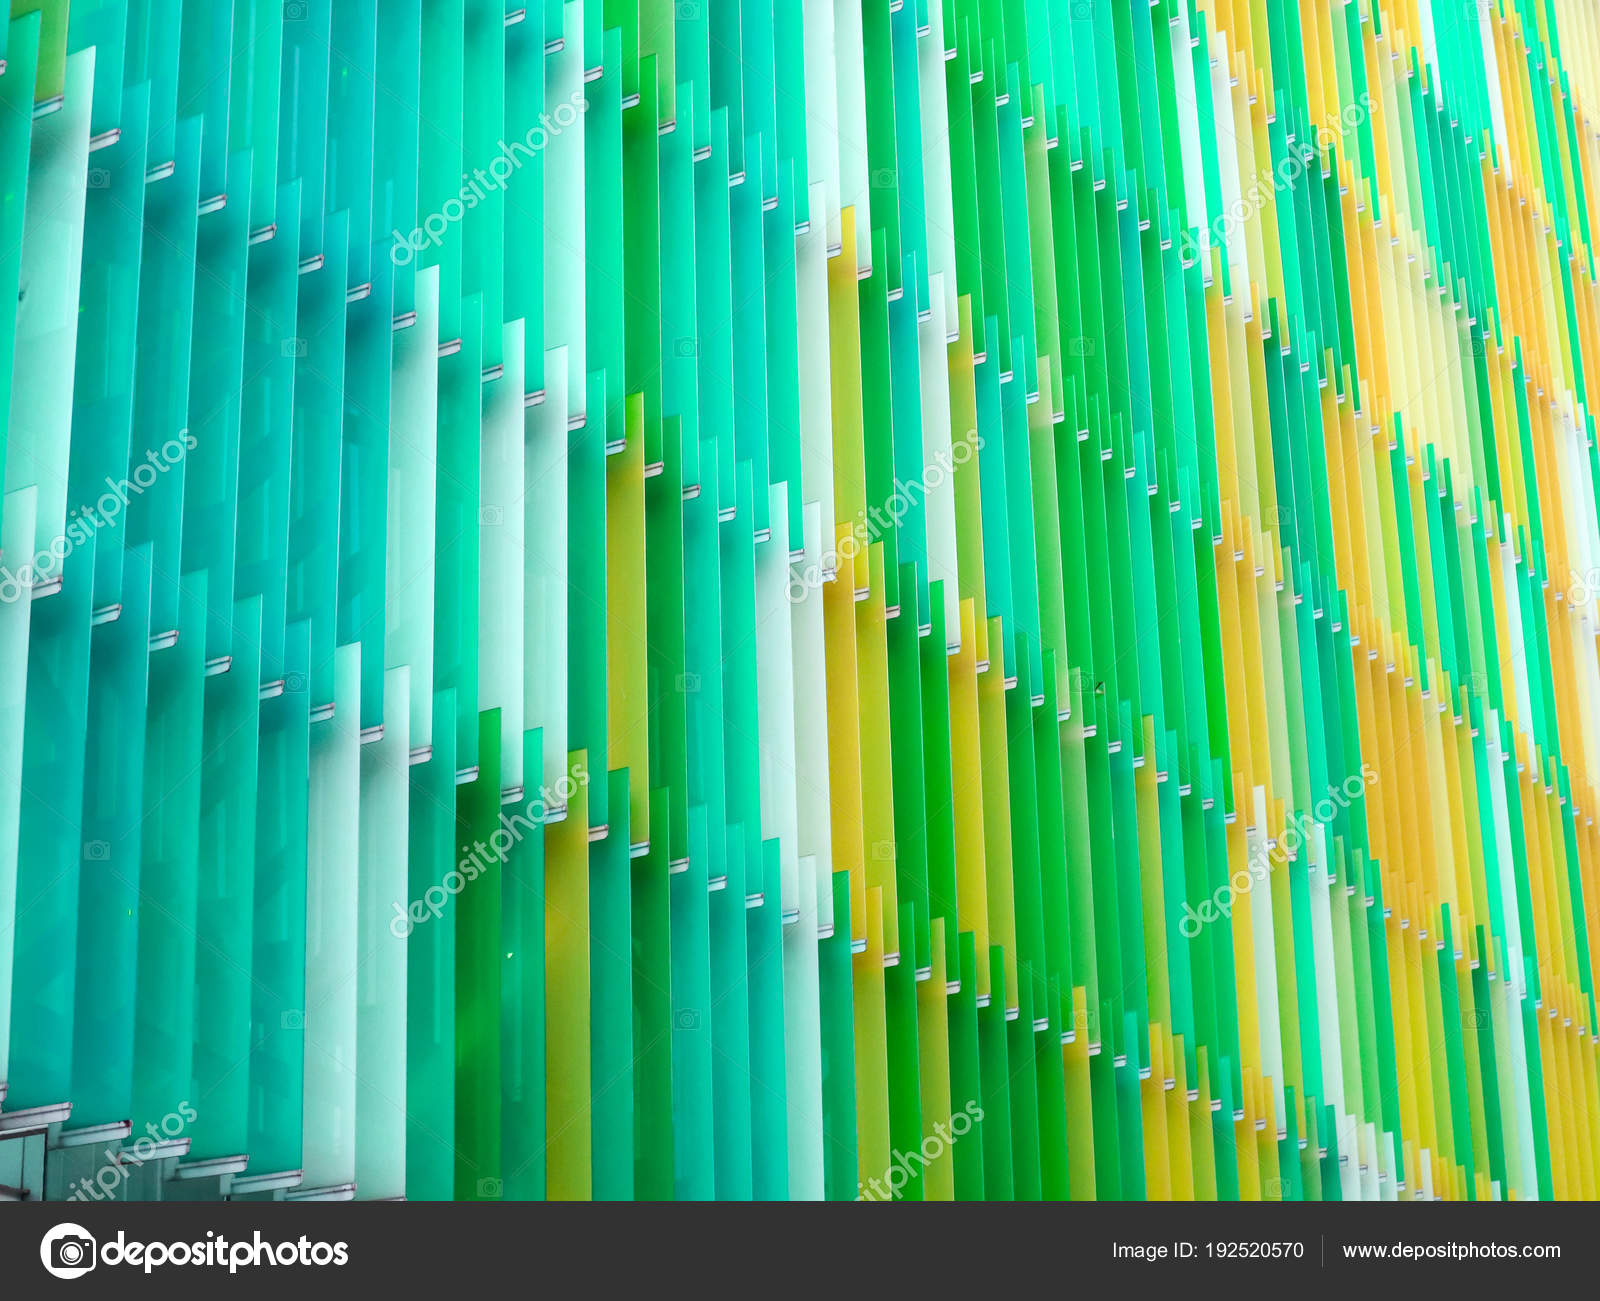 https://st3.depositphotos.com/6301312/19252/i/1600/depositphotos_192520570-stockafbeelding-acryl-plastic-folie-interieur-zeven.jpg